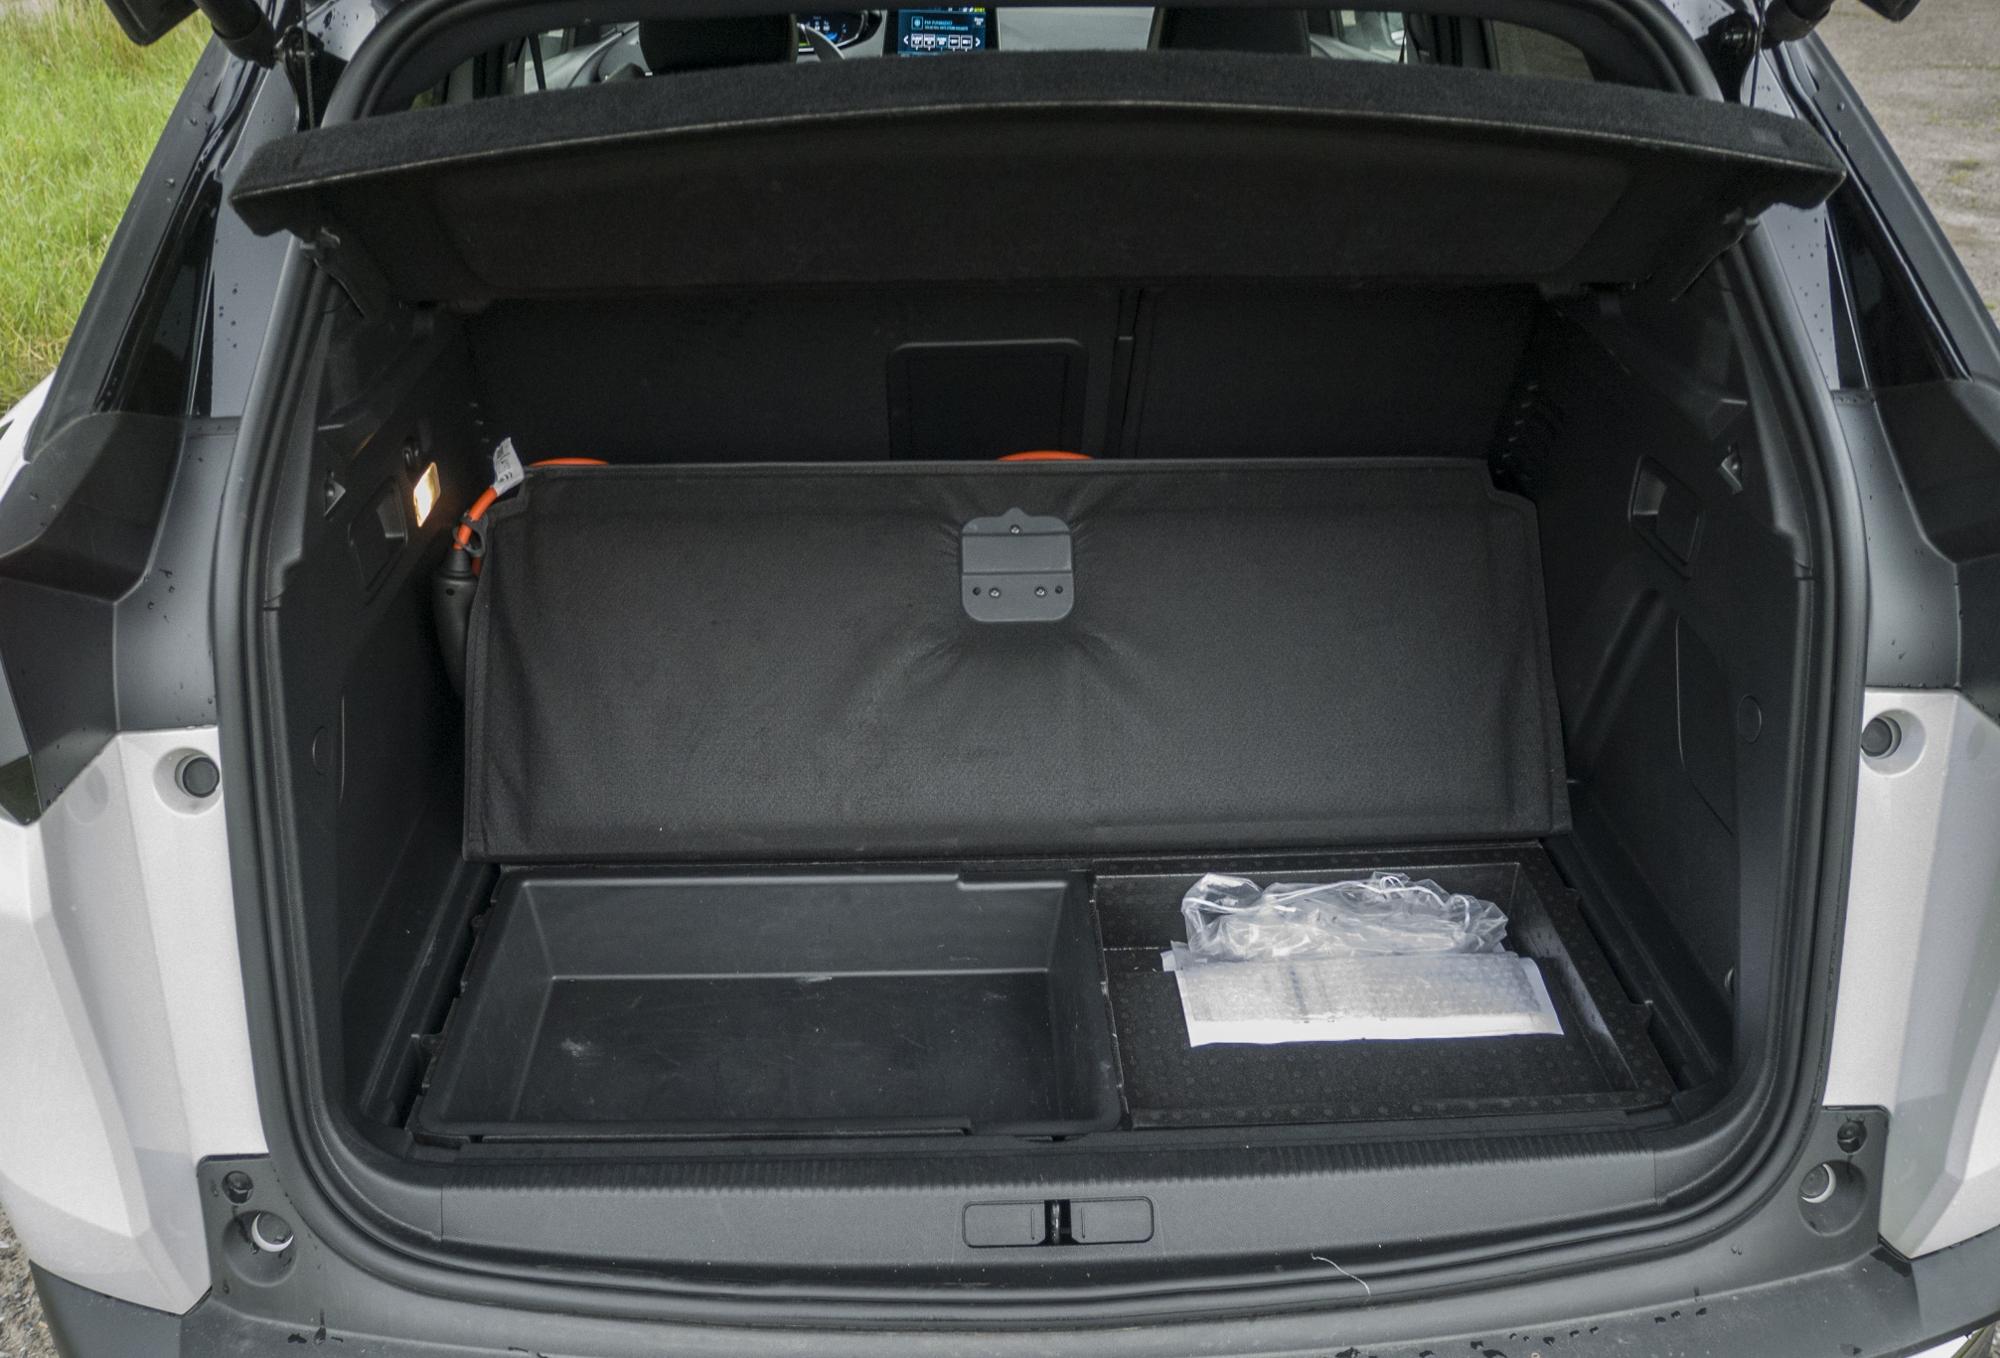 Test: Peugeot 3008 posúva schopnosti plug in hybridov vglzJp7yXv peugeot-3008-hybrid4-16